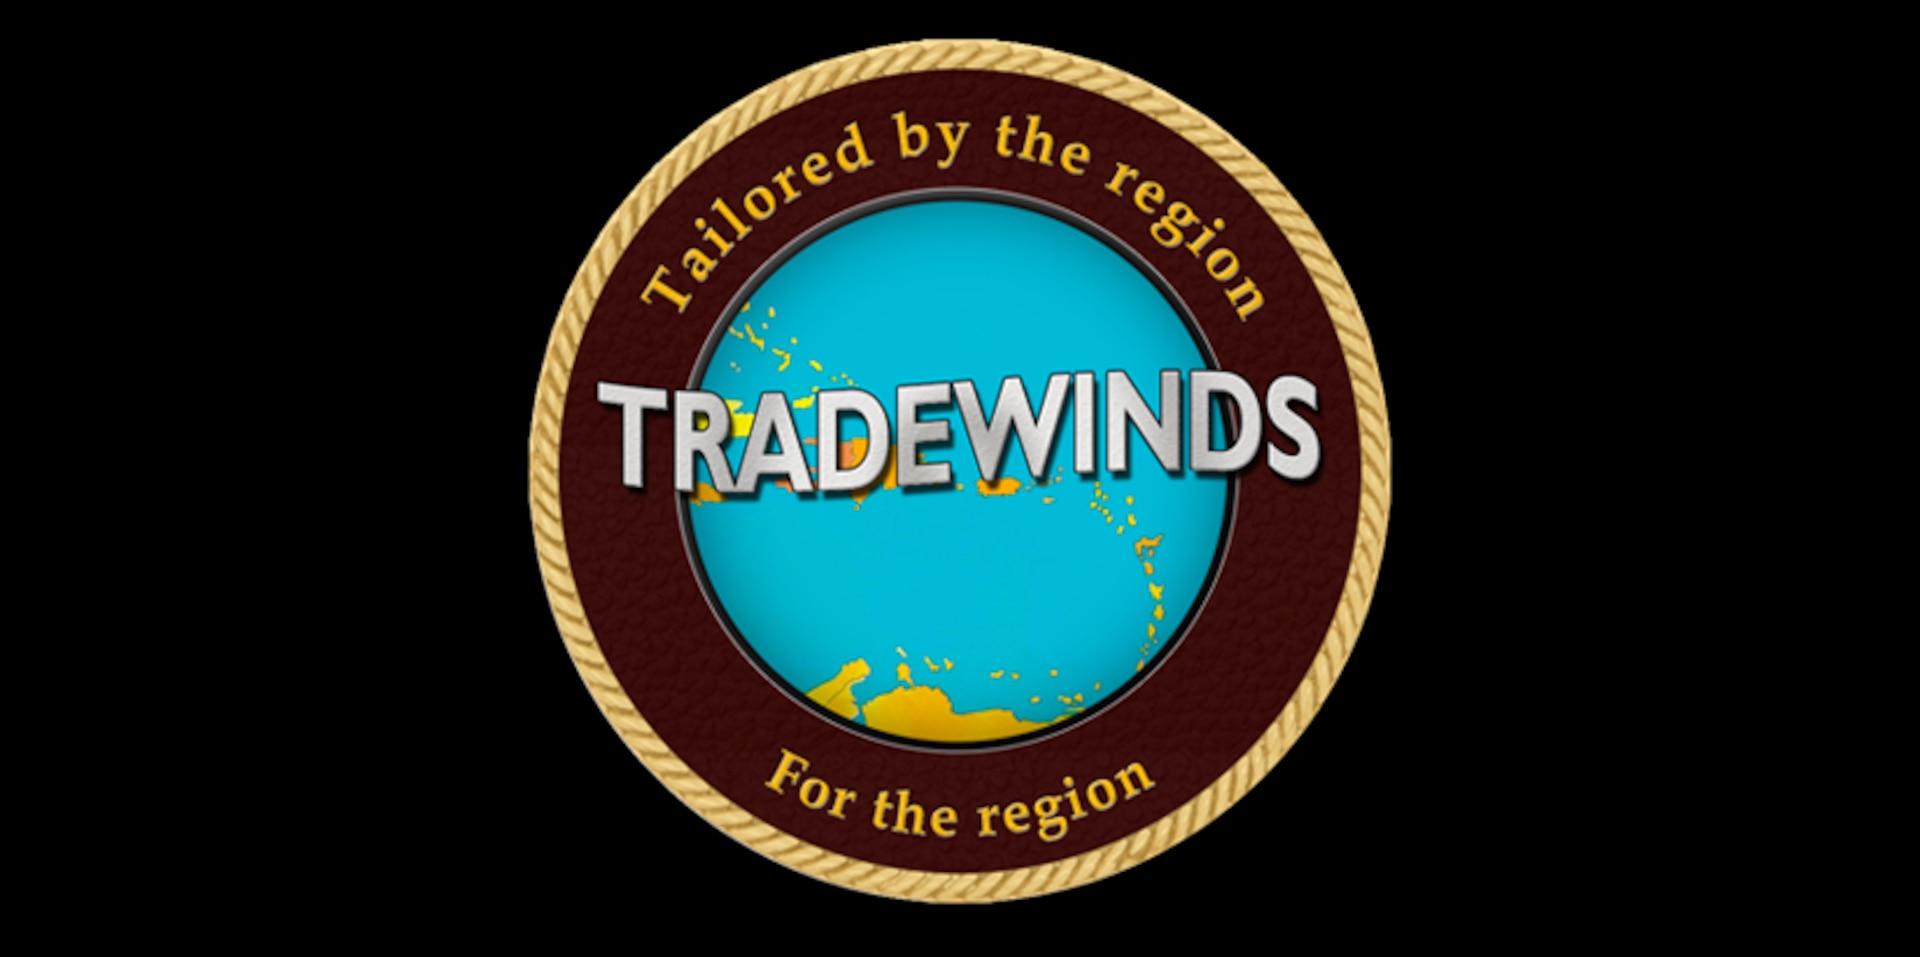 Tradewinds Logo. (U.S. Southern Command)